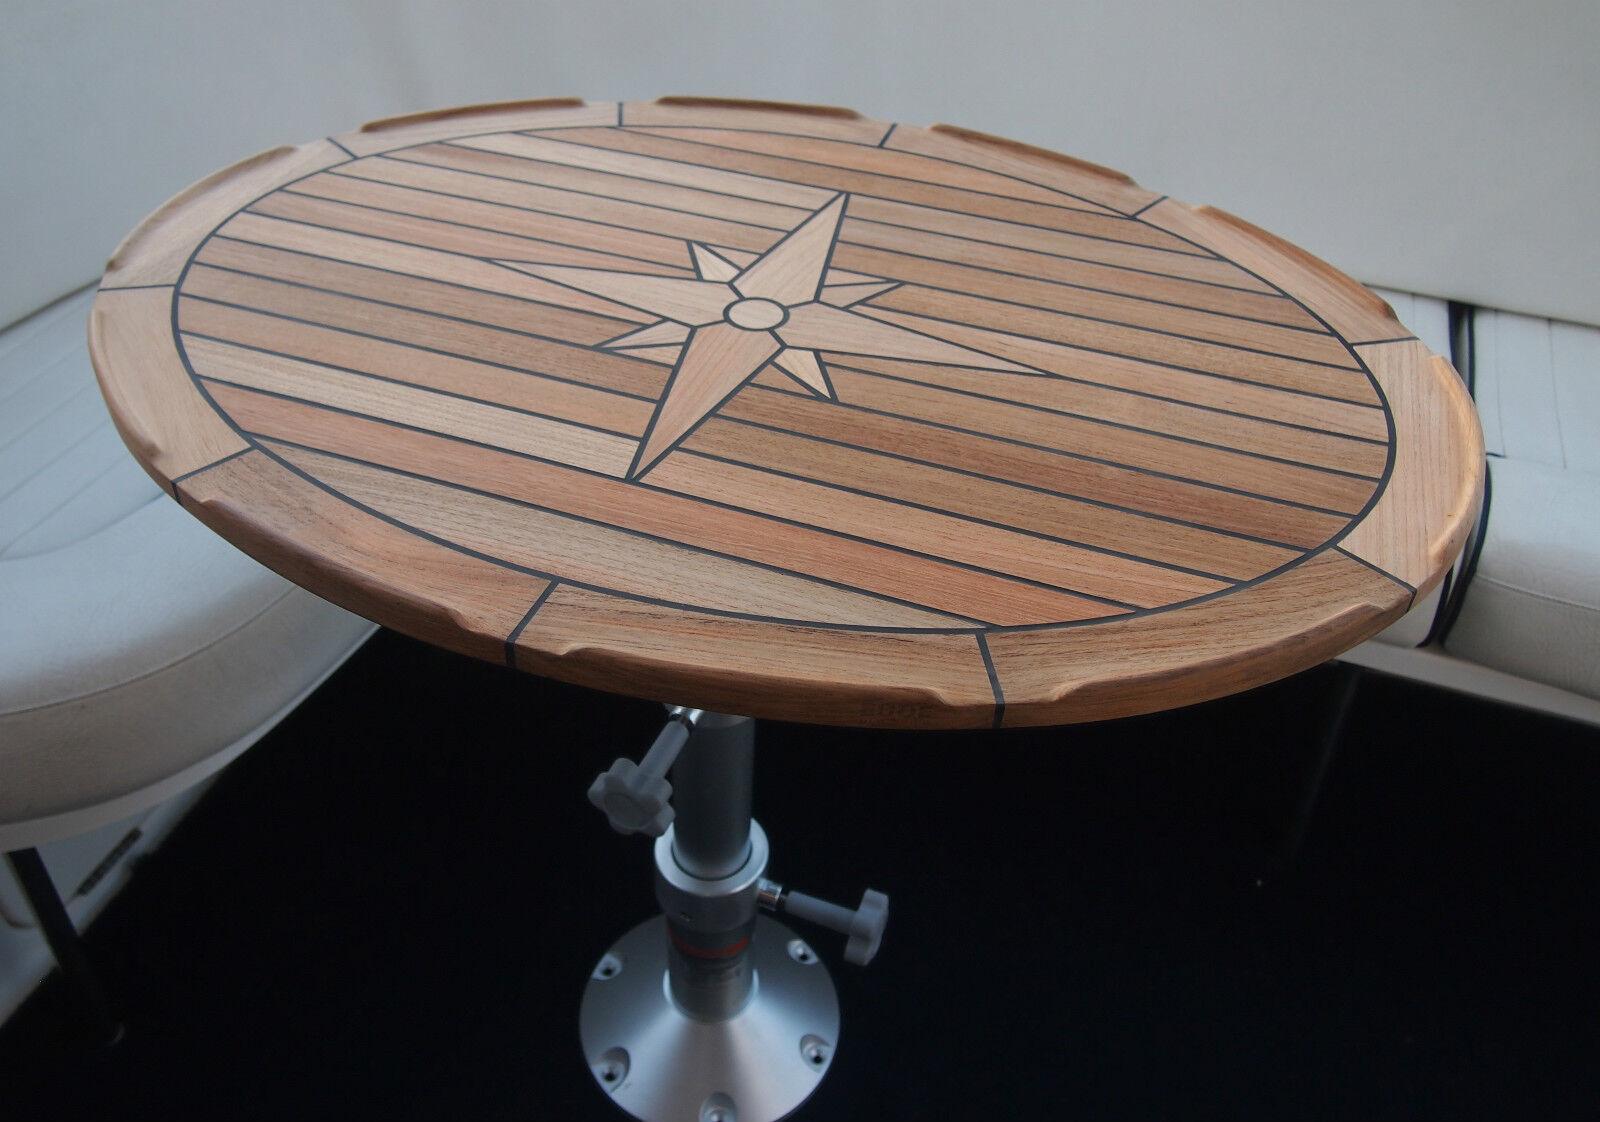 Teak Table - Nautic Star  Ellipes  - Two Sizes Available - Marine - Boat - Yacht